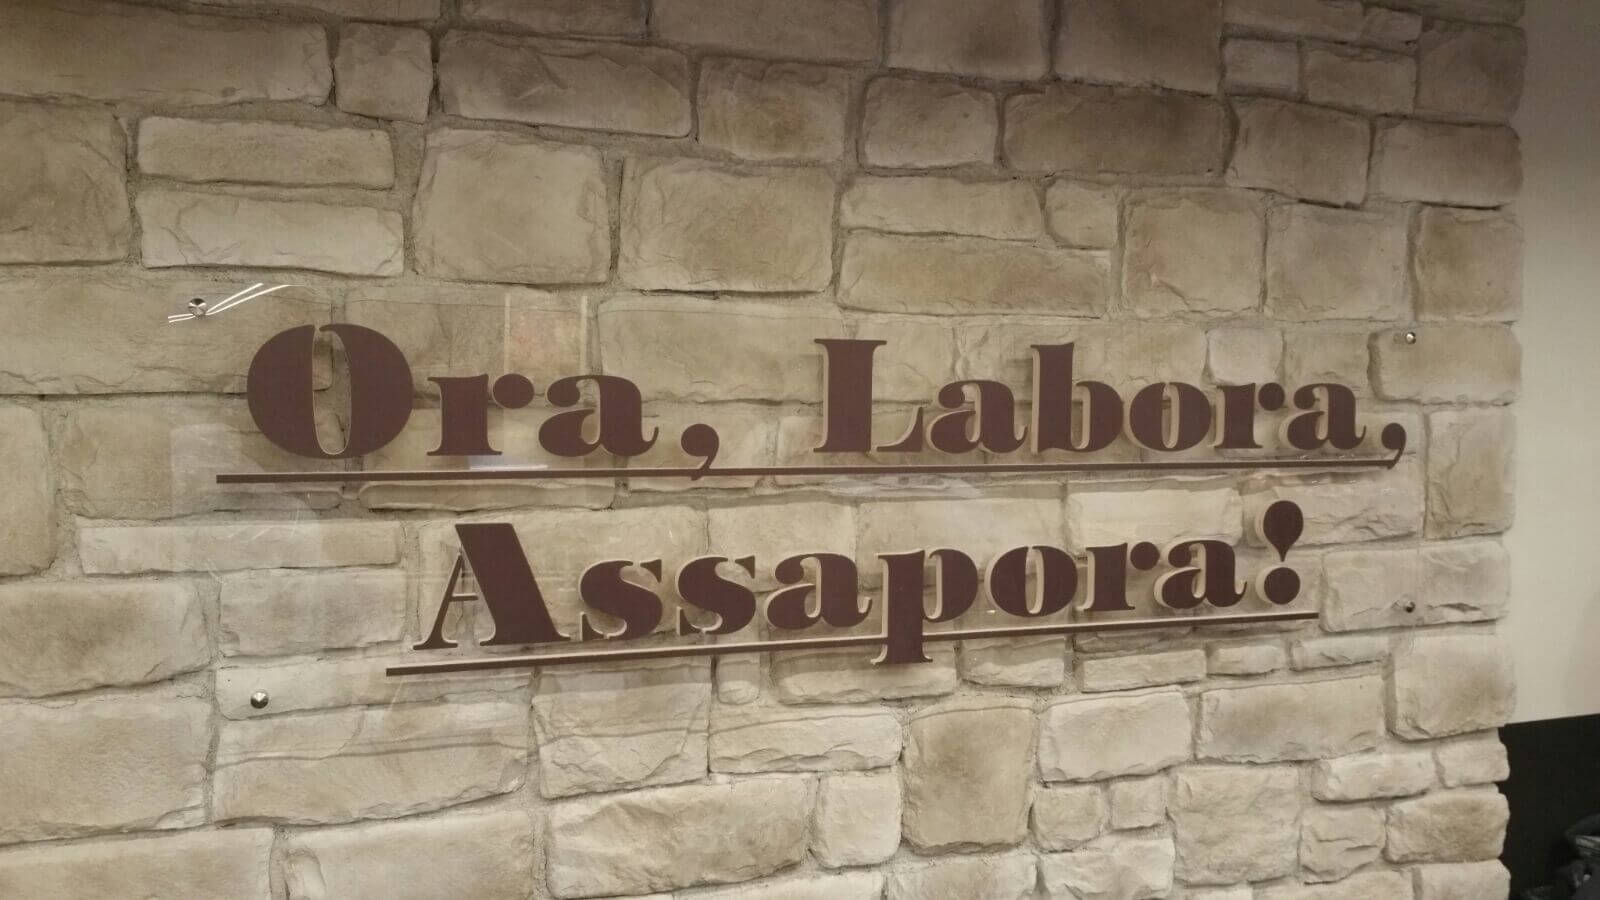 Allestimenti Grafox - Shop & Food - Renzini Bottega Firenze